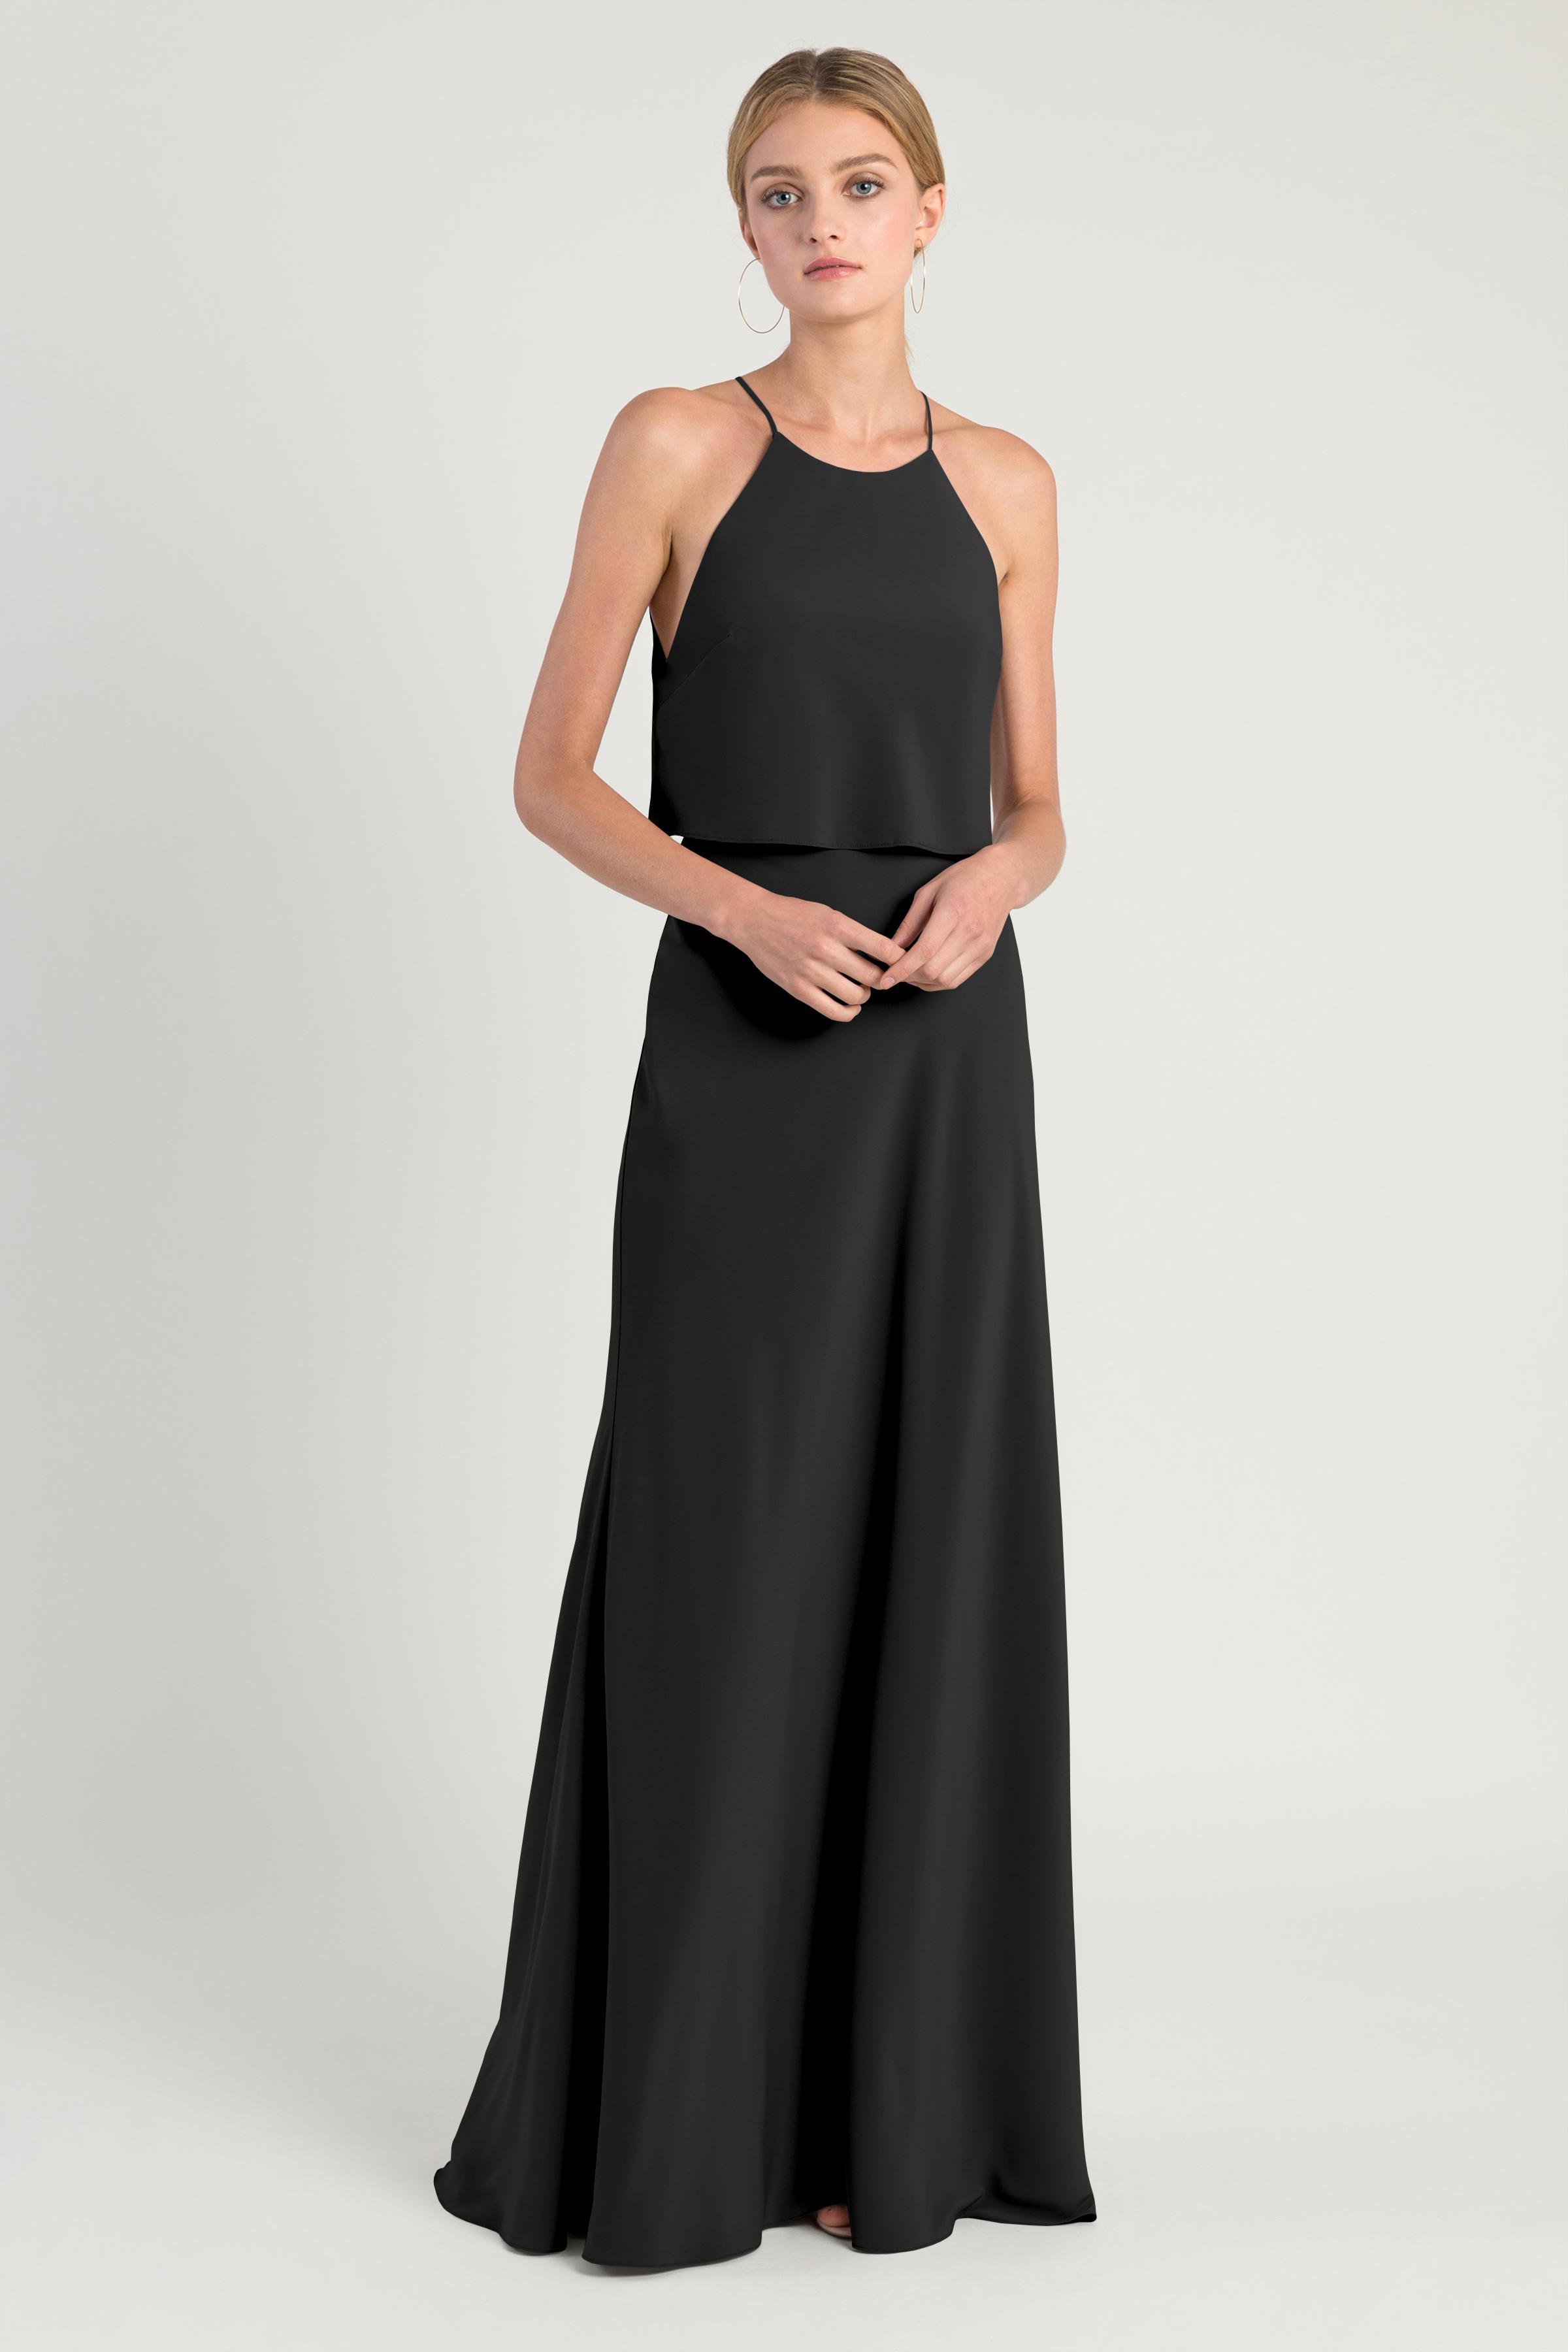 Elle Bridesmaids Dress by Jenny Yoo - Black